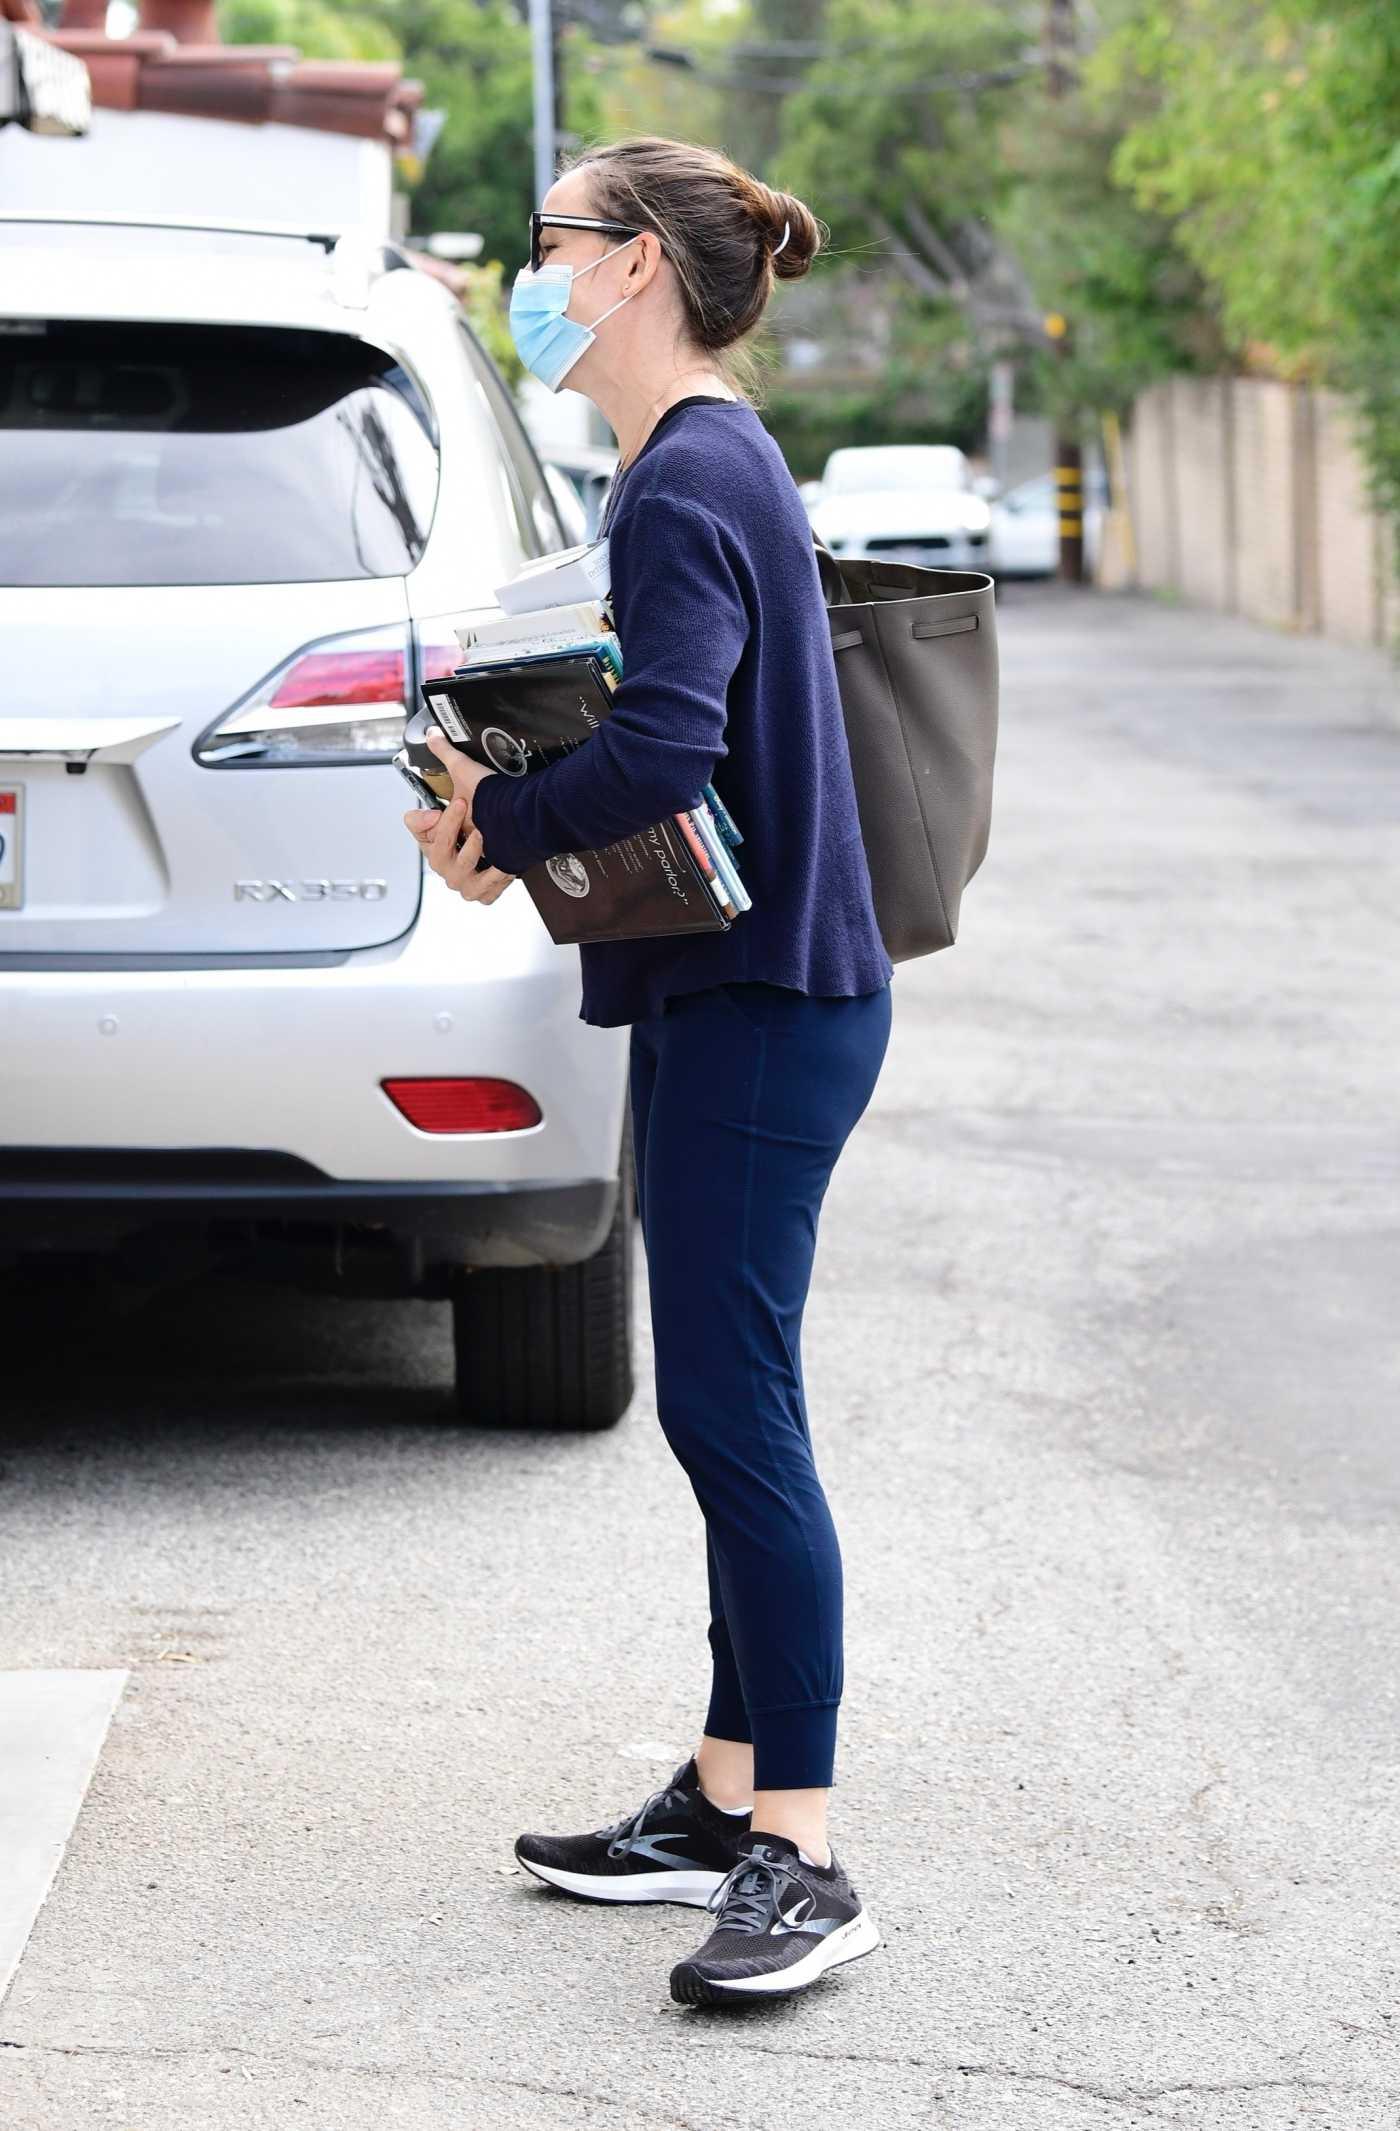 Jennifer Garner in a Black Sneakers Arrives at Her Office in Brentwood 01/13/2021